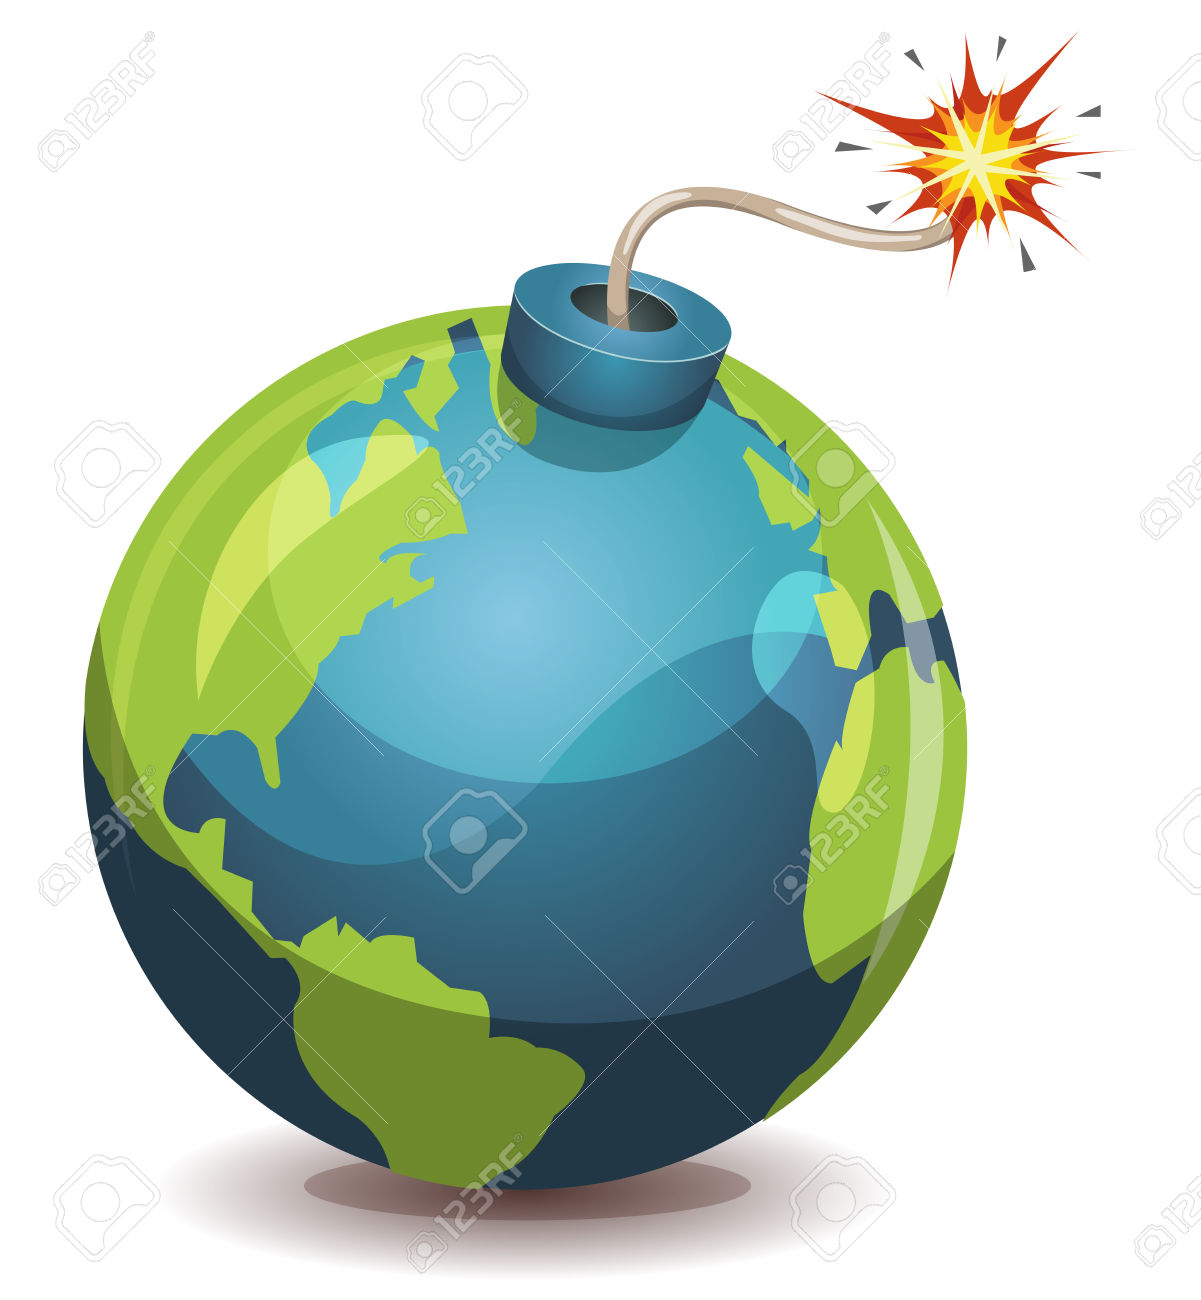 Burning World Map Images & Stock Pictures. Royalty Free Burning.